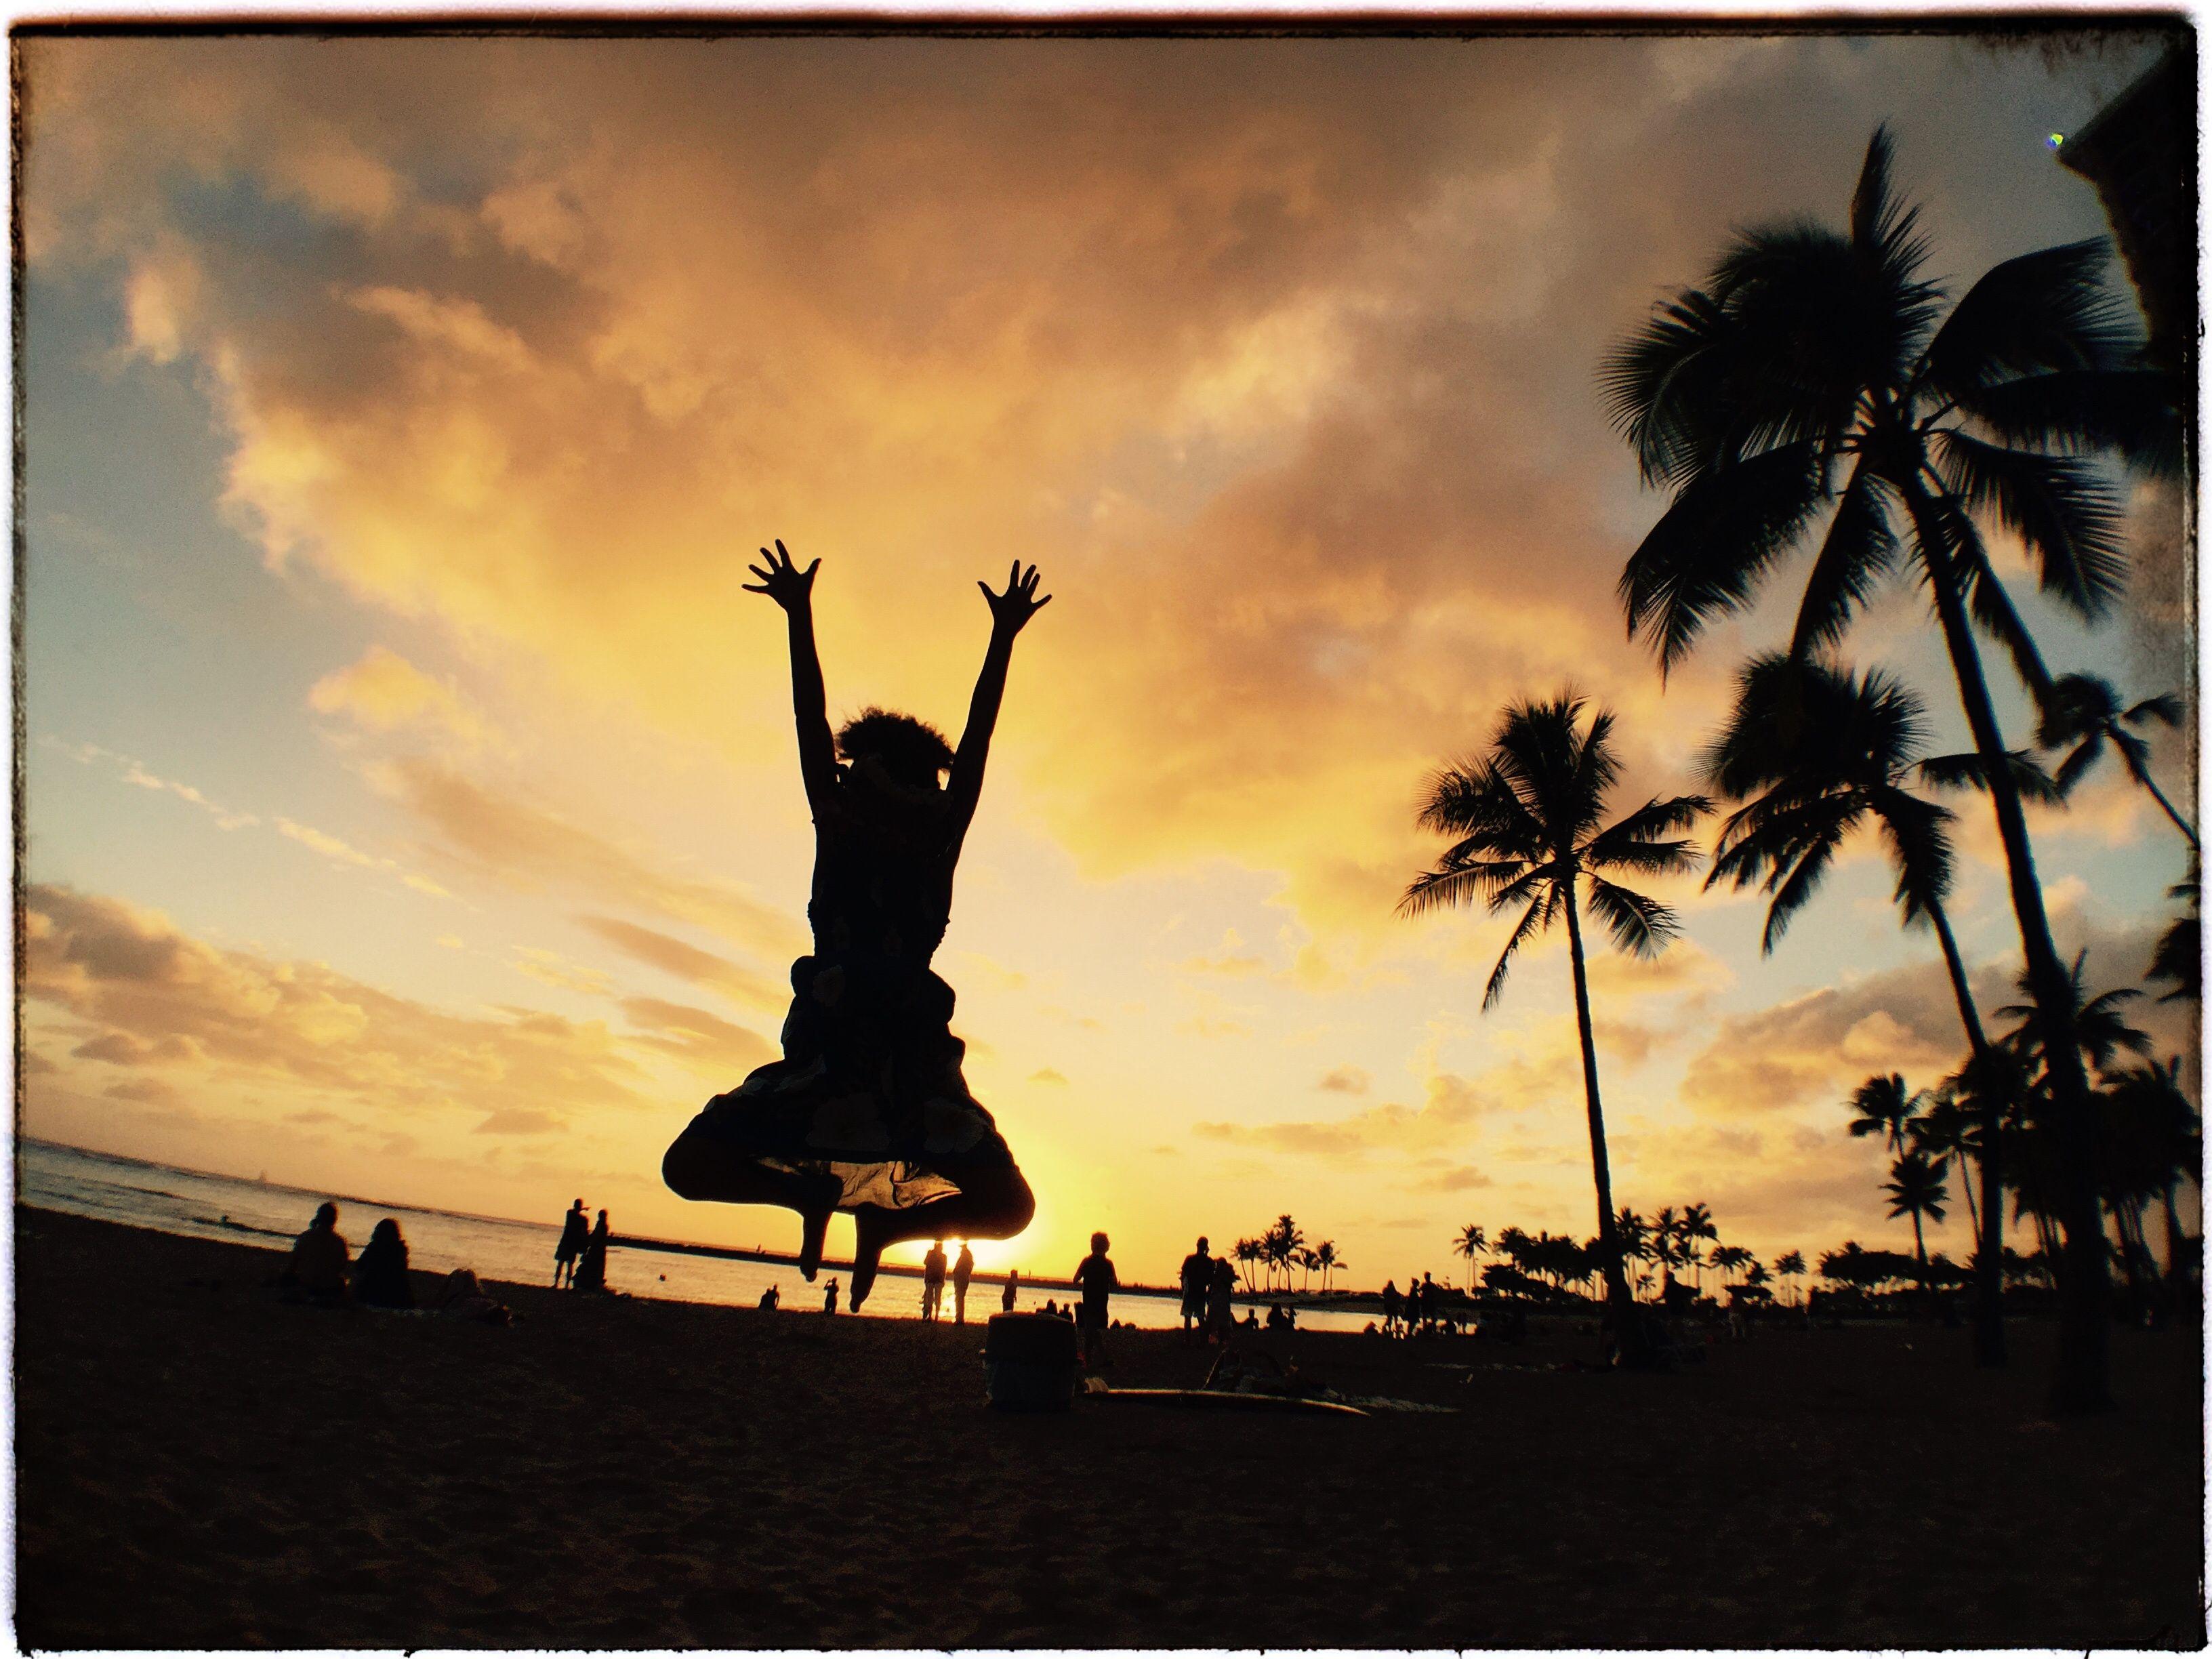 Aloha and Mahalo Hawaii! Kon'nichiwa Japan.